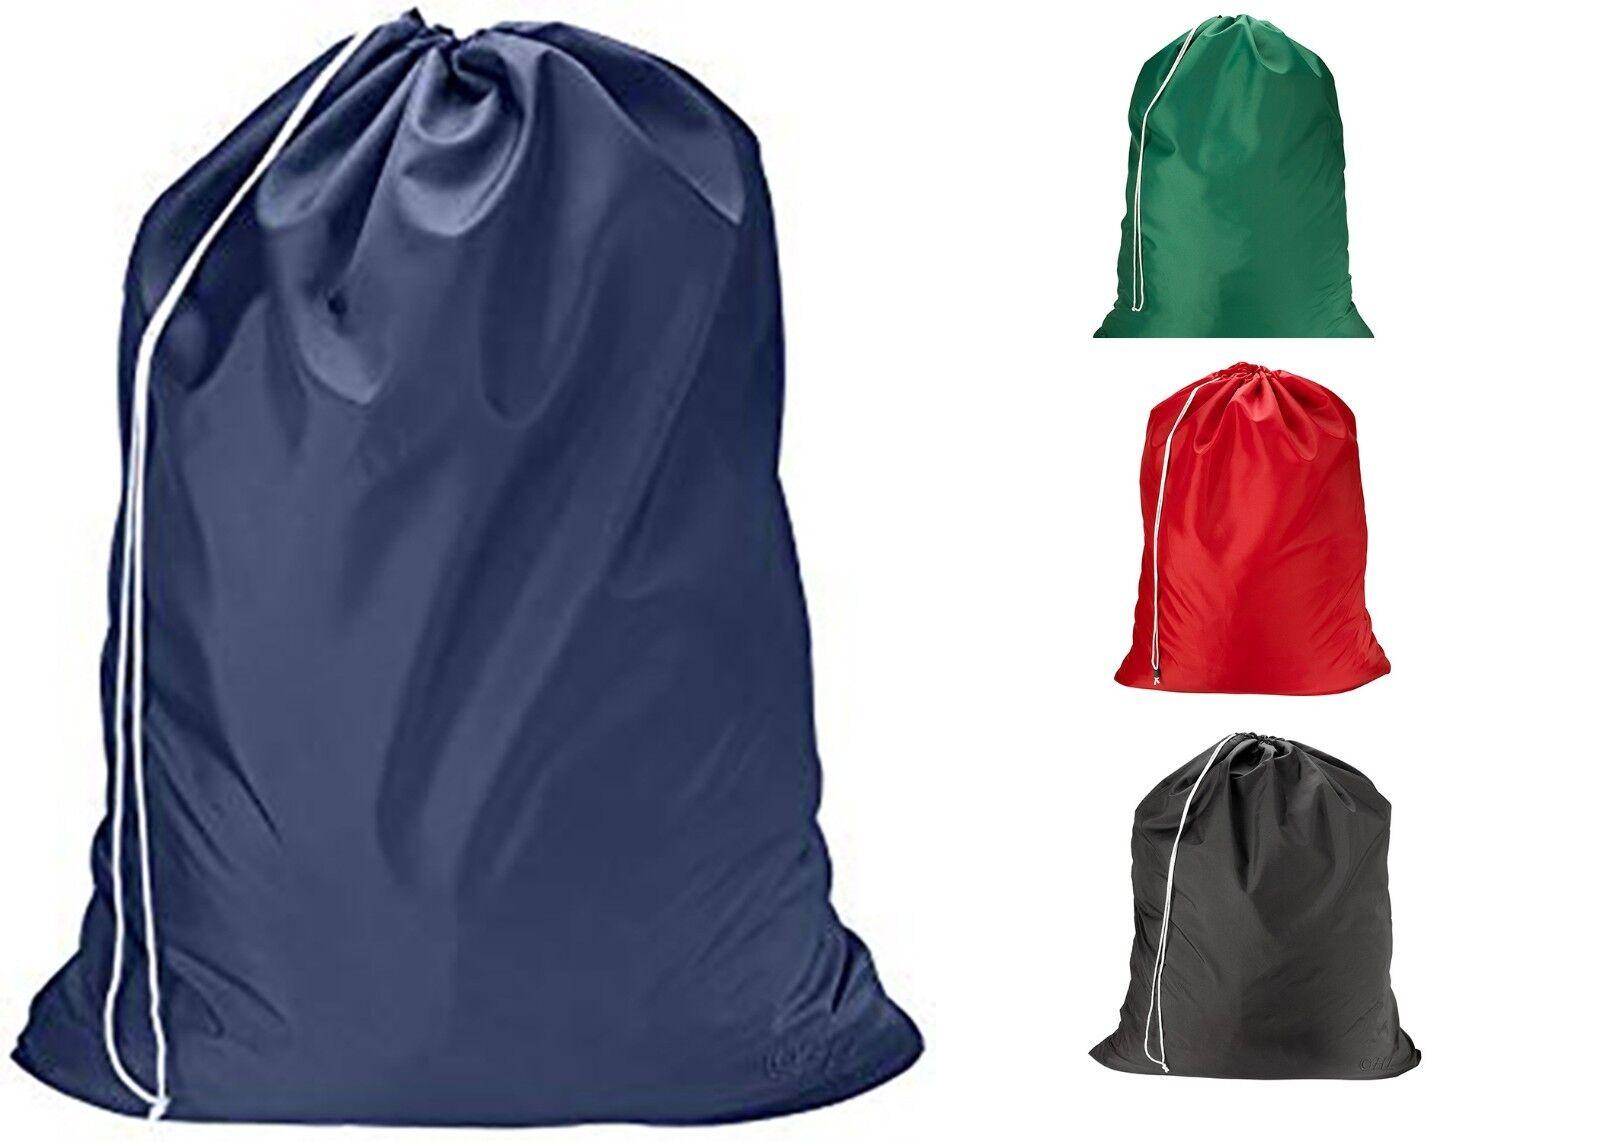 Heavy Duty Extra Large Nylon Laundry Bag Locking Drawstring